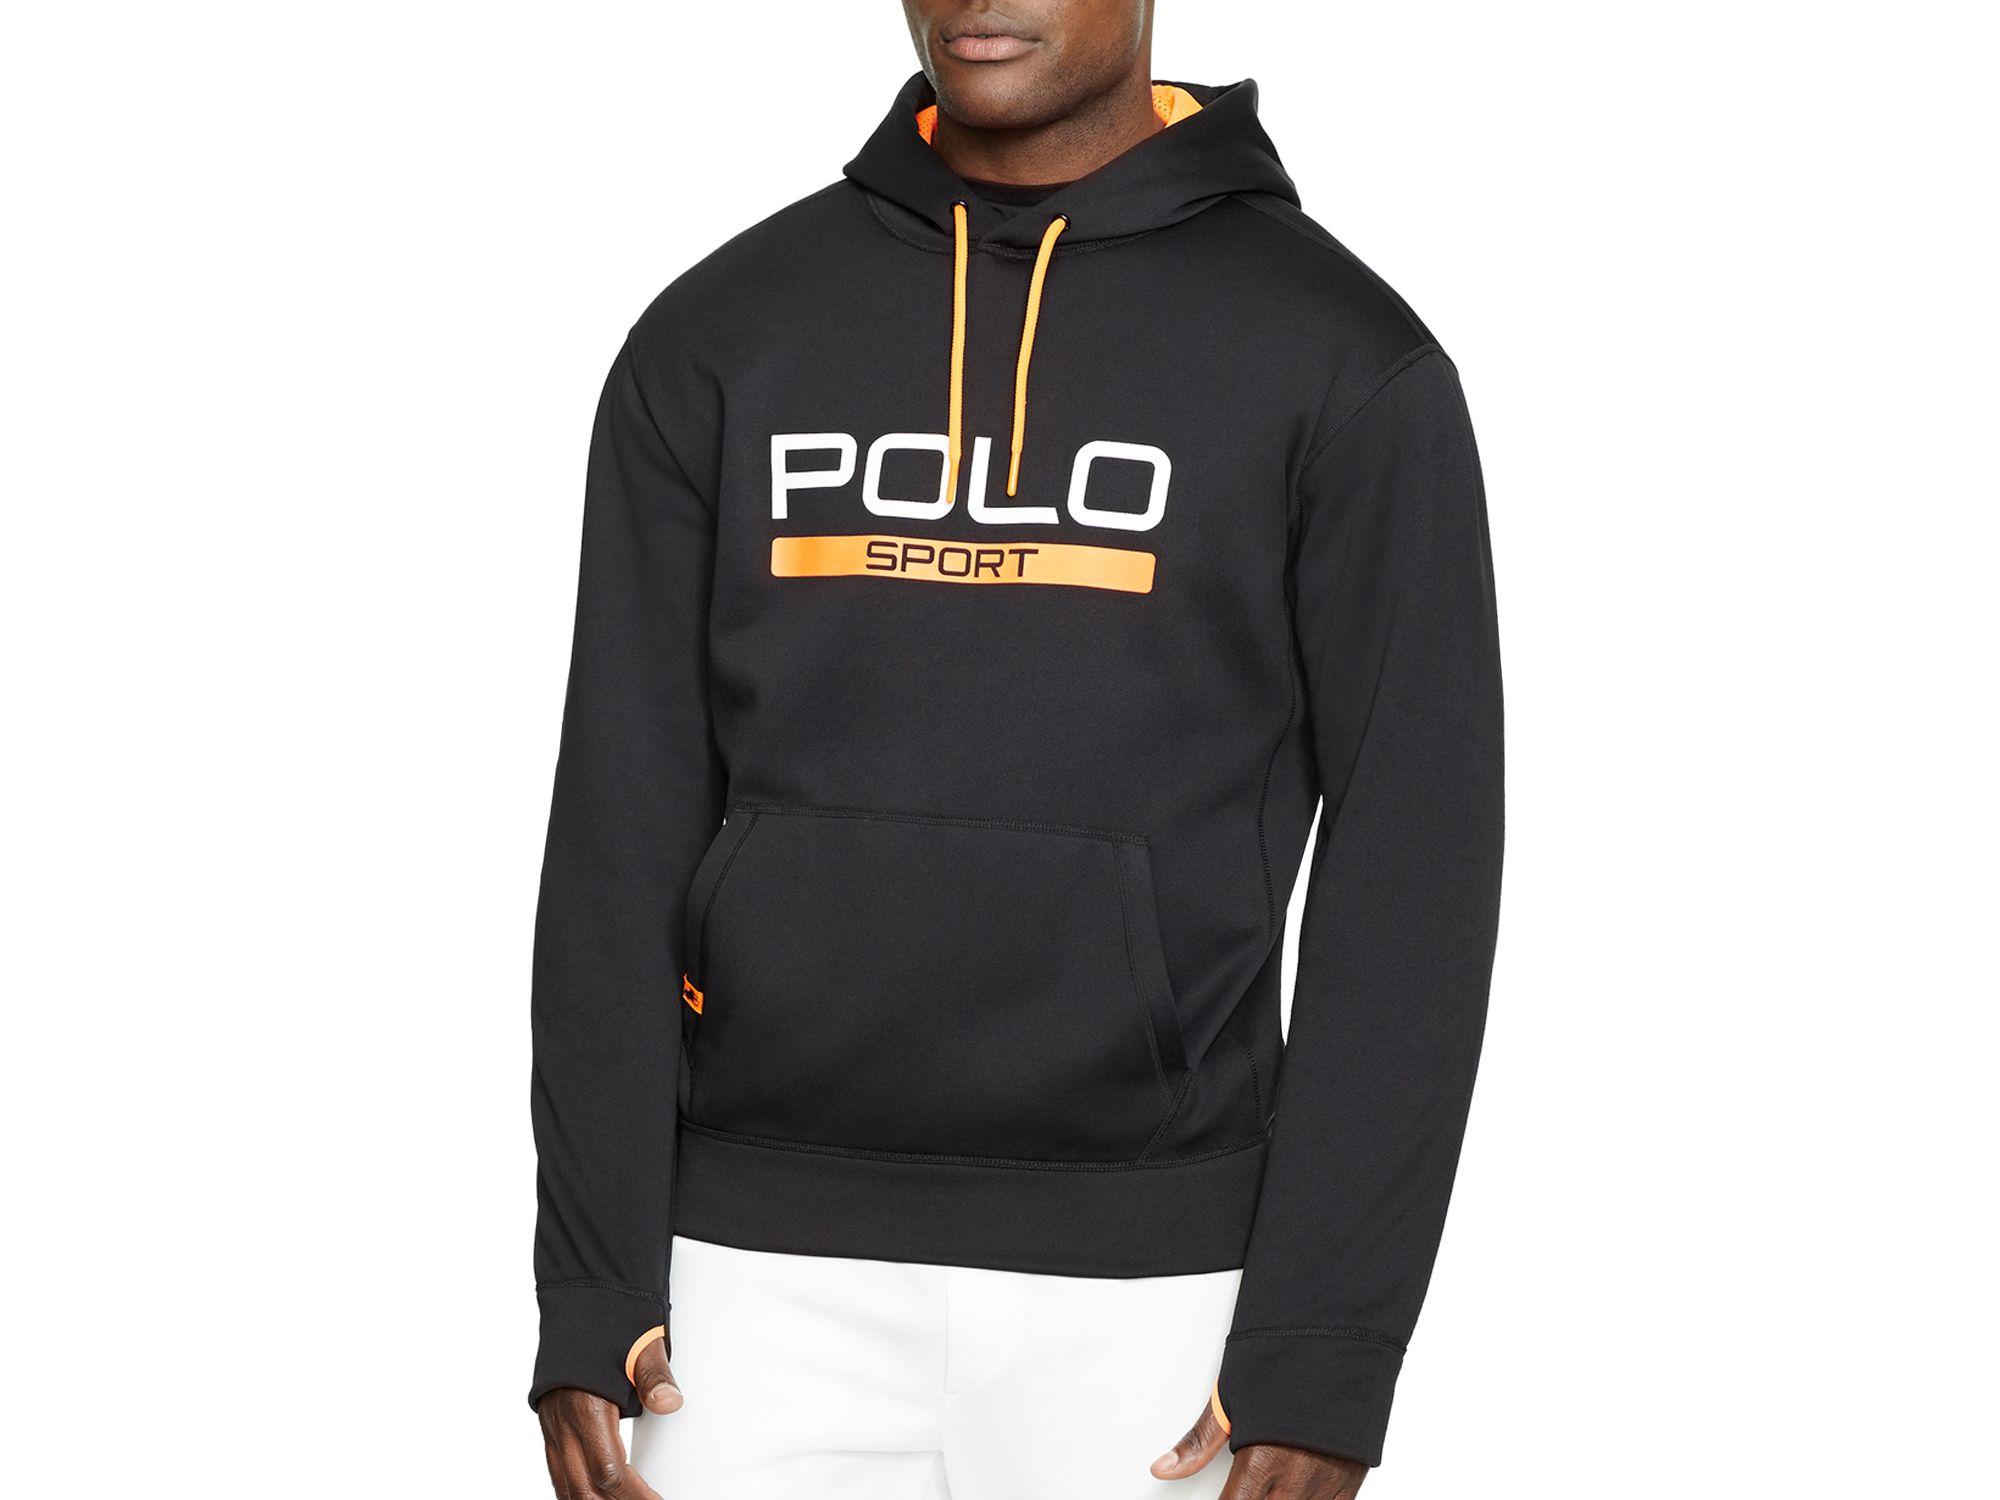 cff07275 Polo Ralph Lauren Black Polo Sport Tech Fleece Hoodie for men